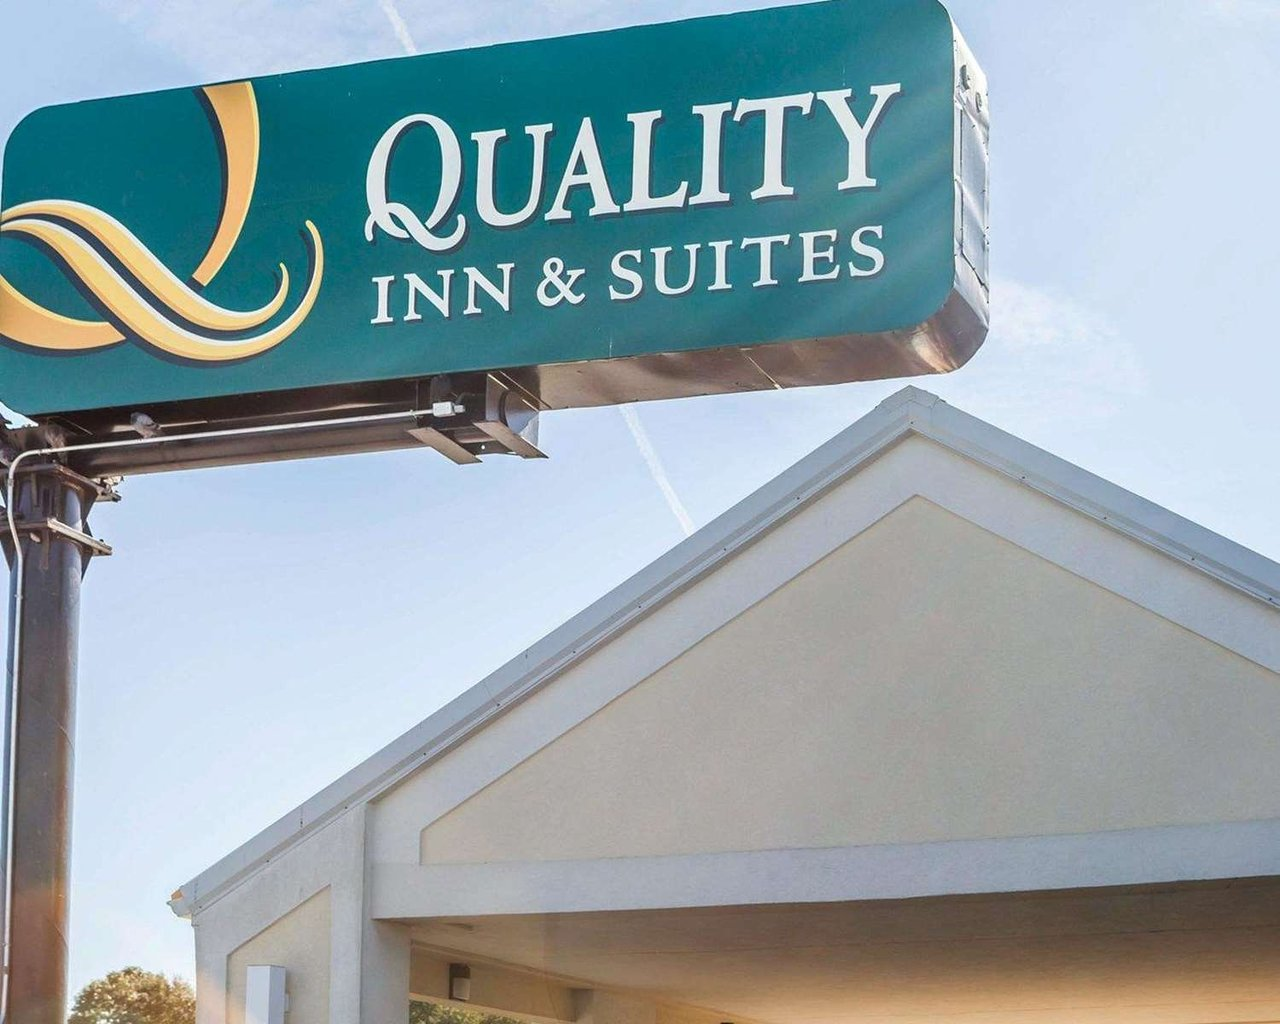 QUALITY INN & SUITES $55 ($̶7̶9̶) - Updated 2019 Prices